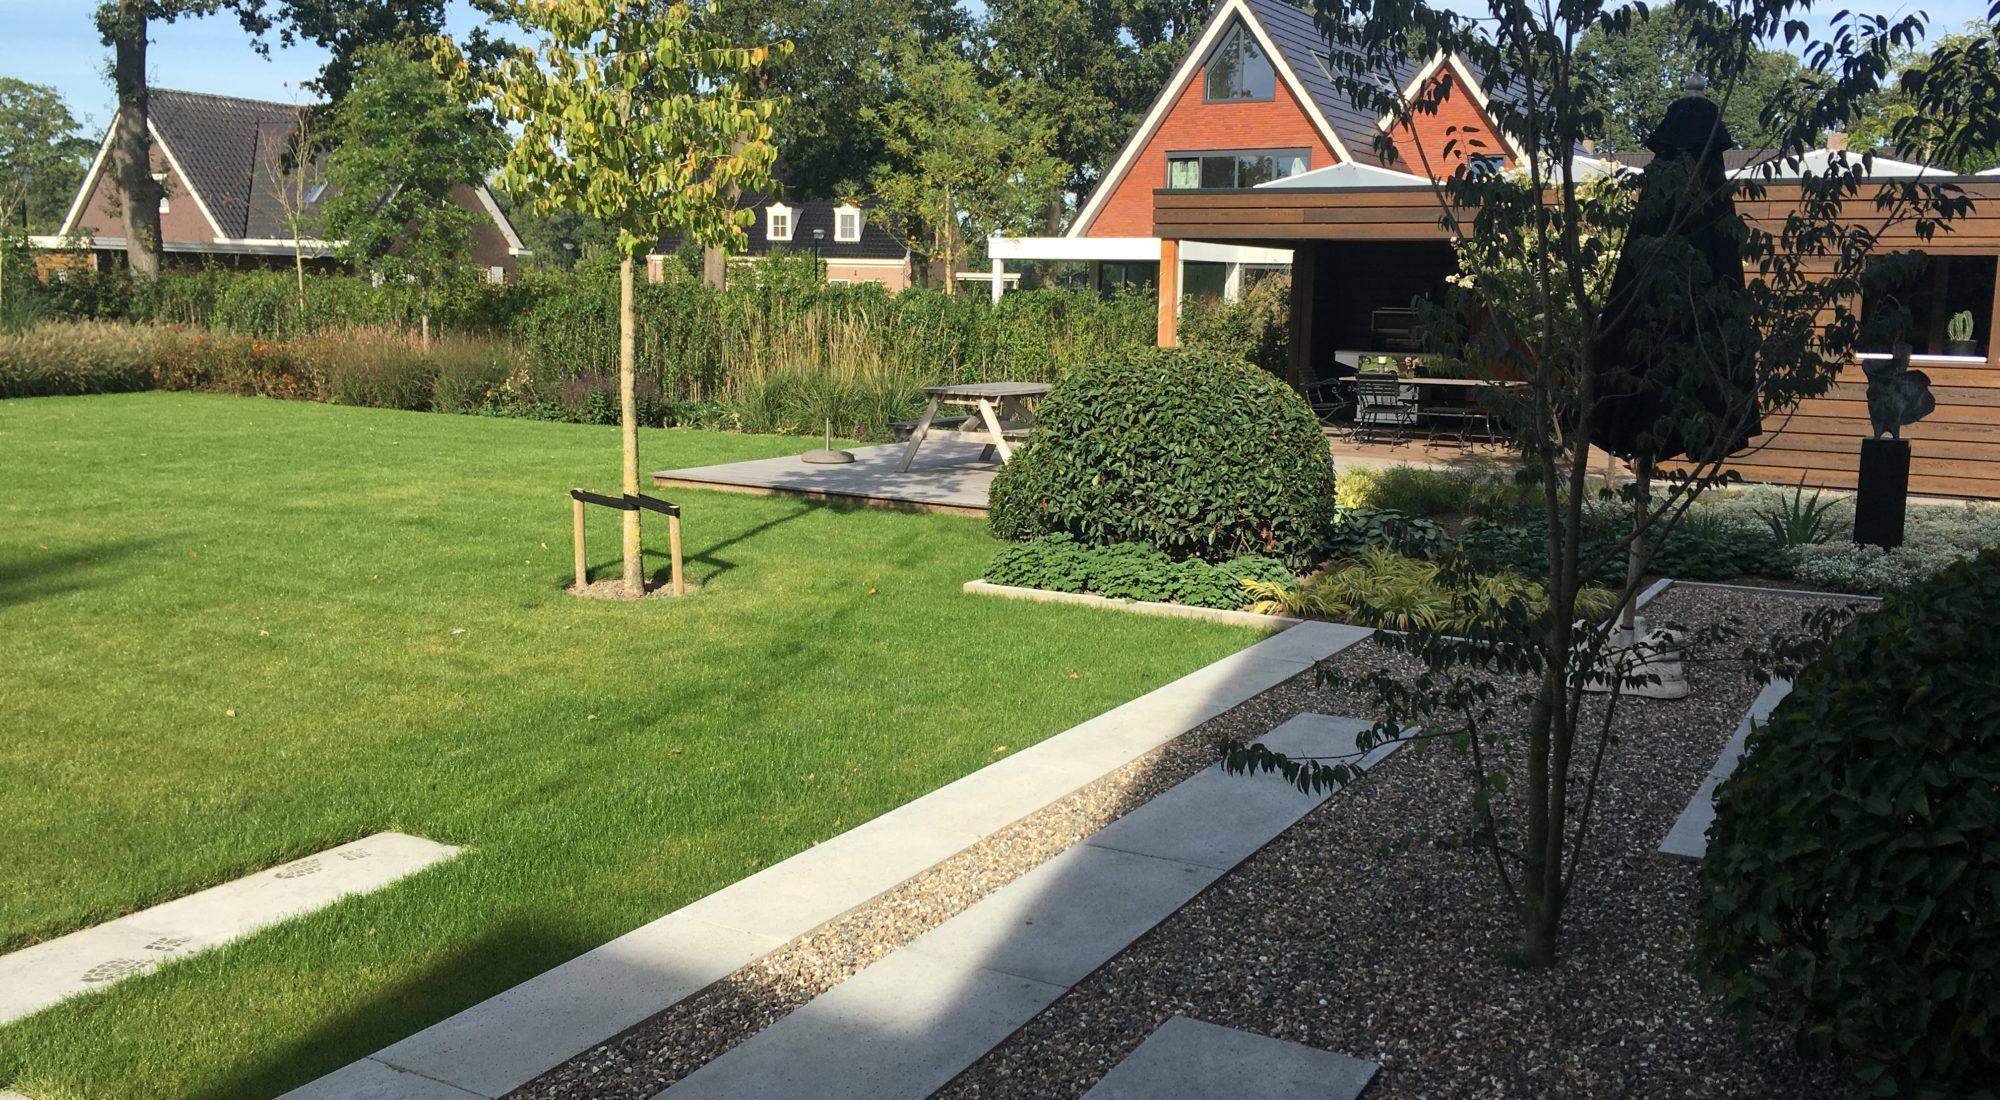 Exclusieve tuin_de_prachttuinen4